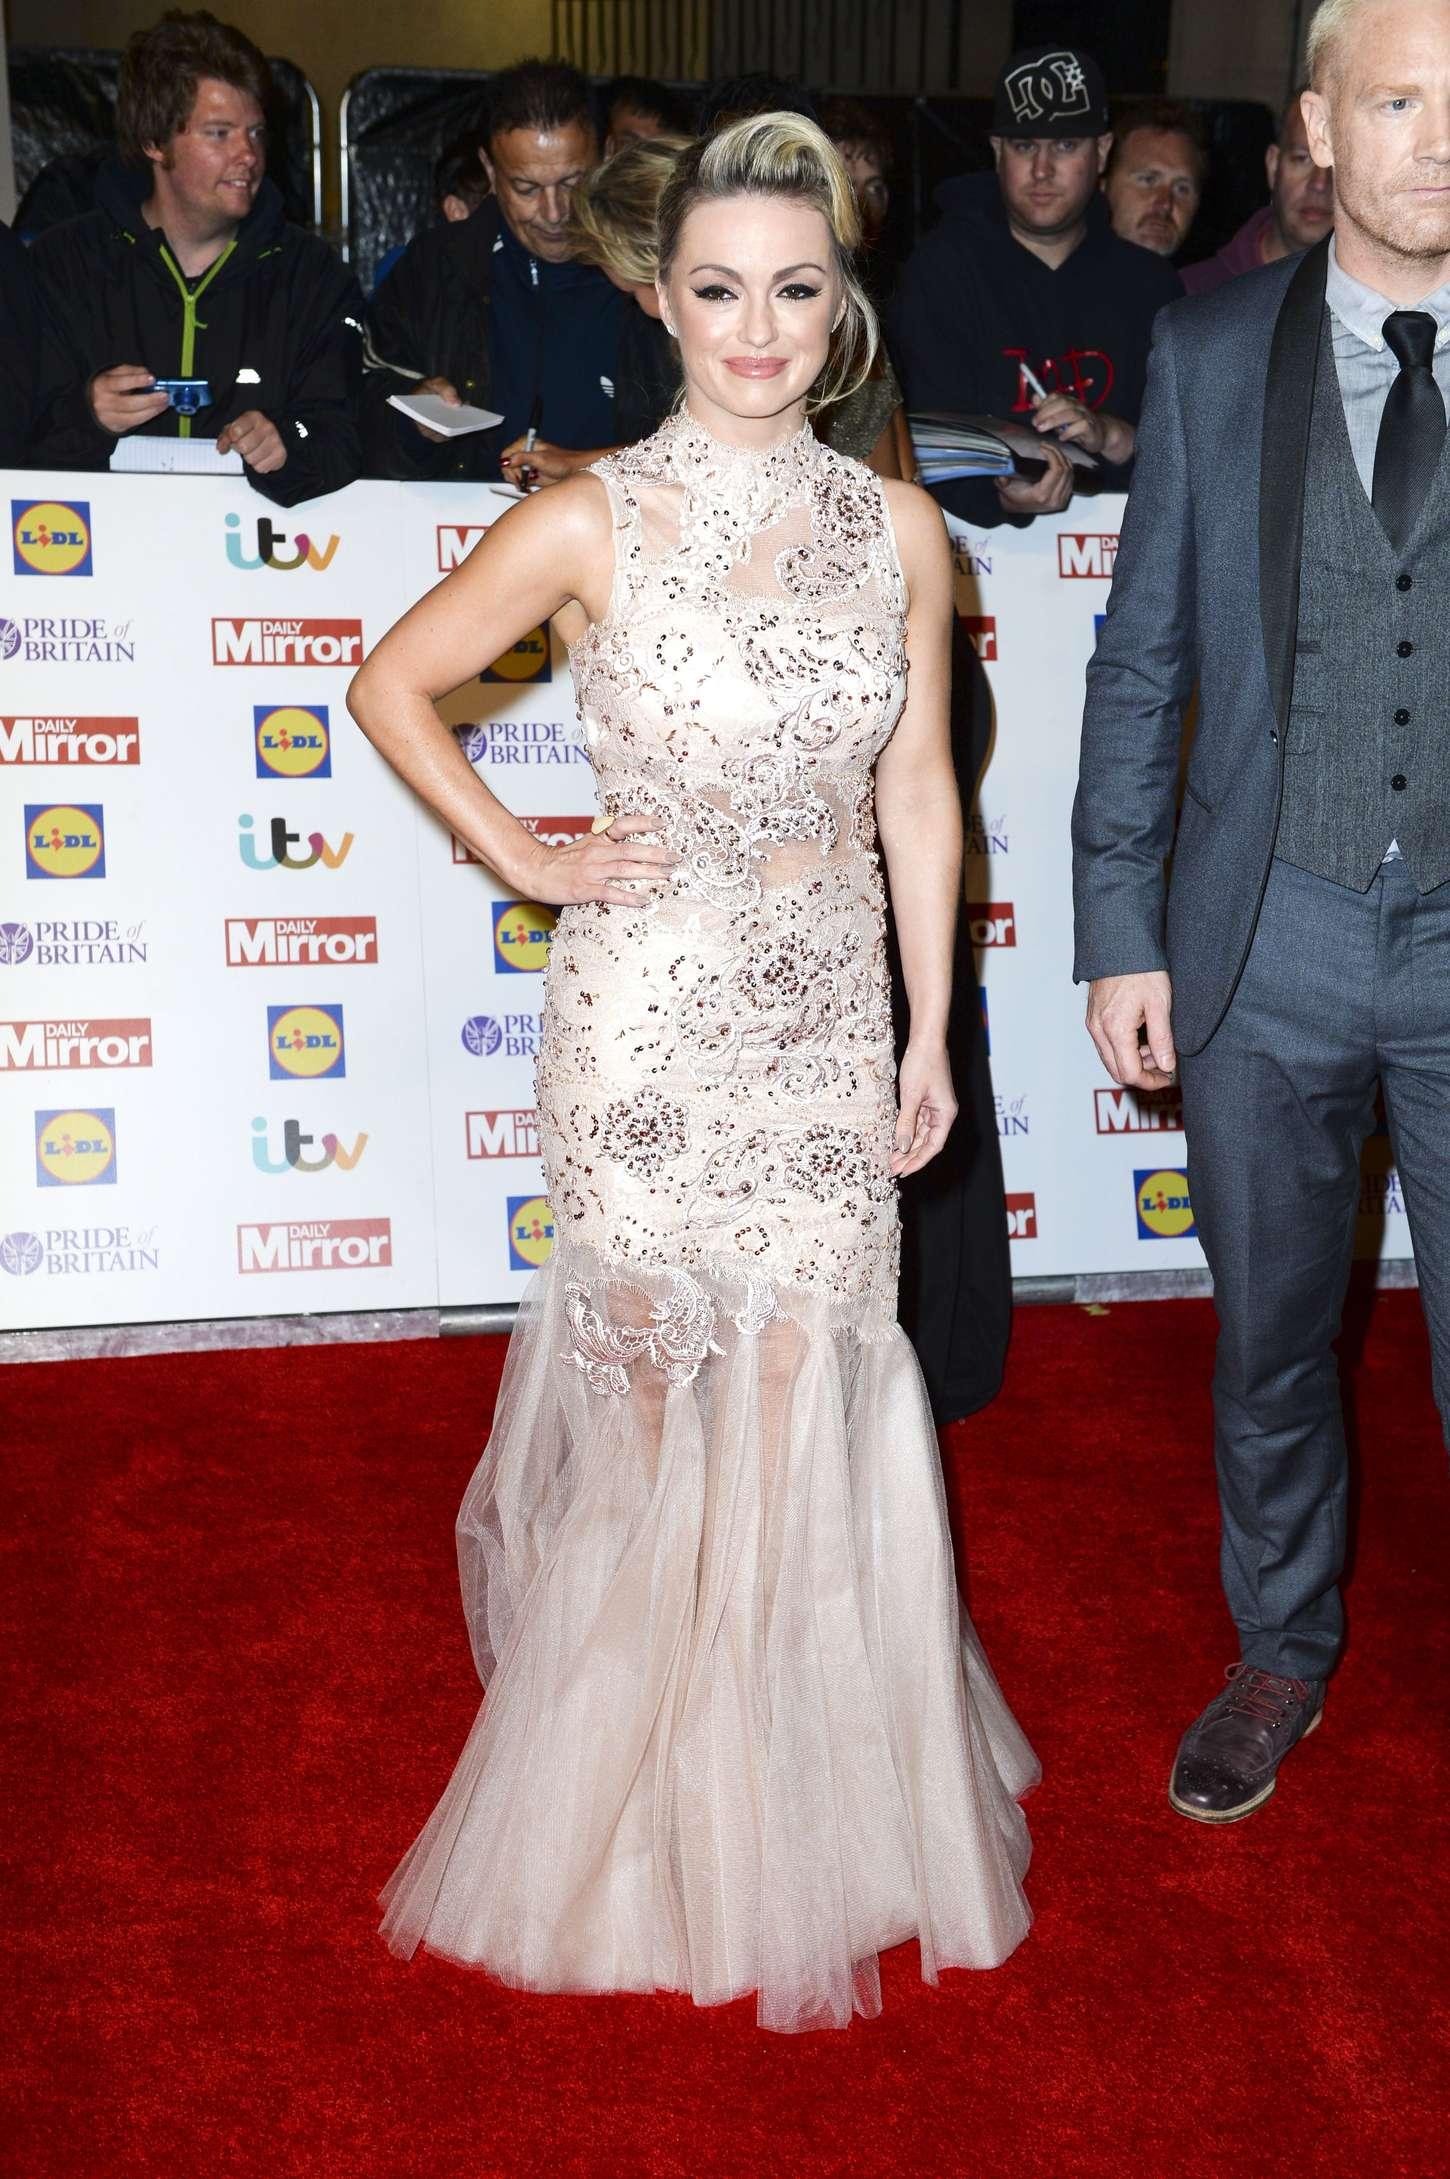 Ola Jordan Pride of Britain Awards in London